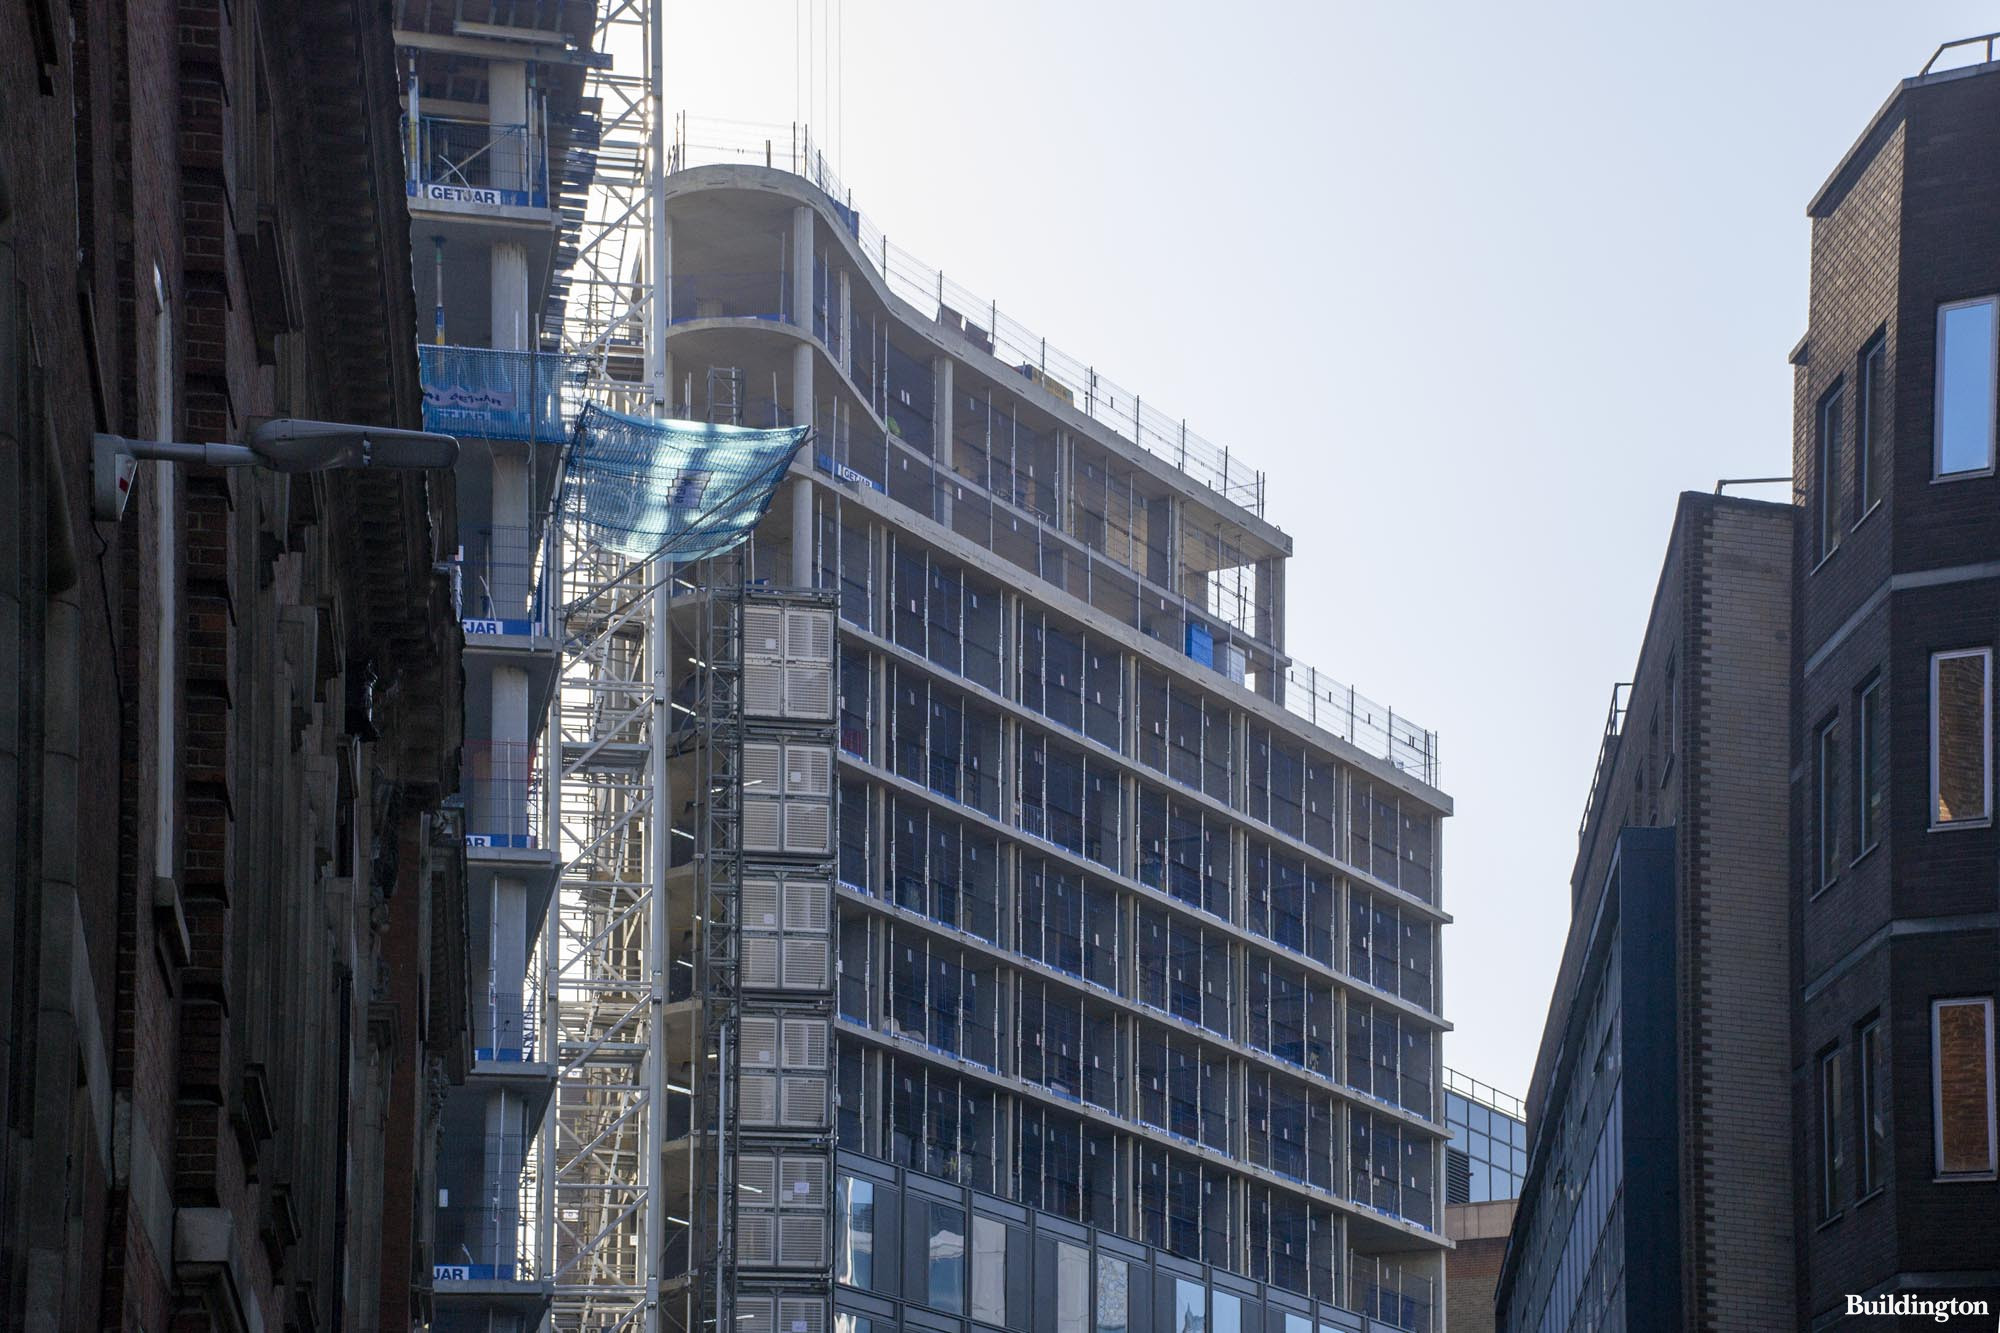 Luminary London under construction in February 2020.